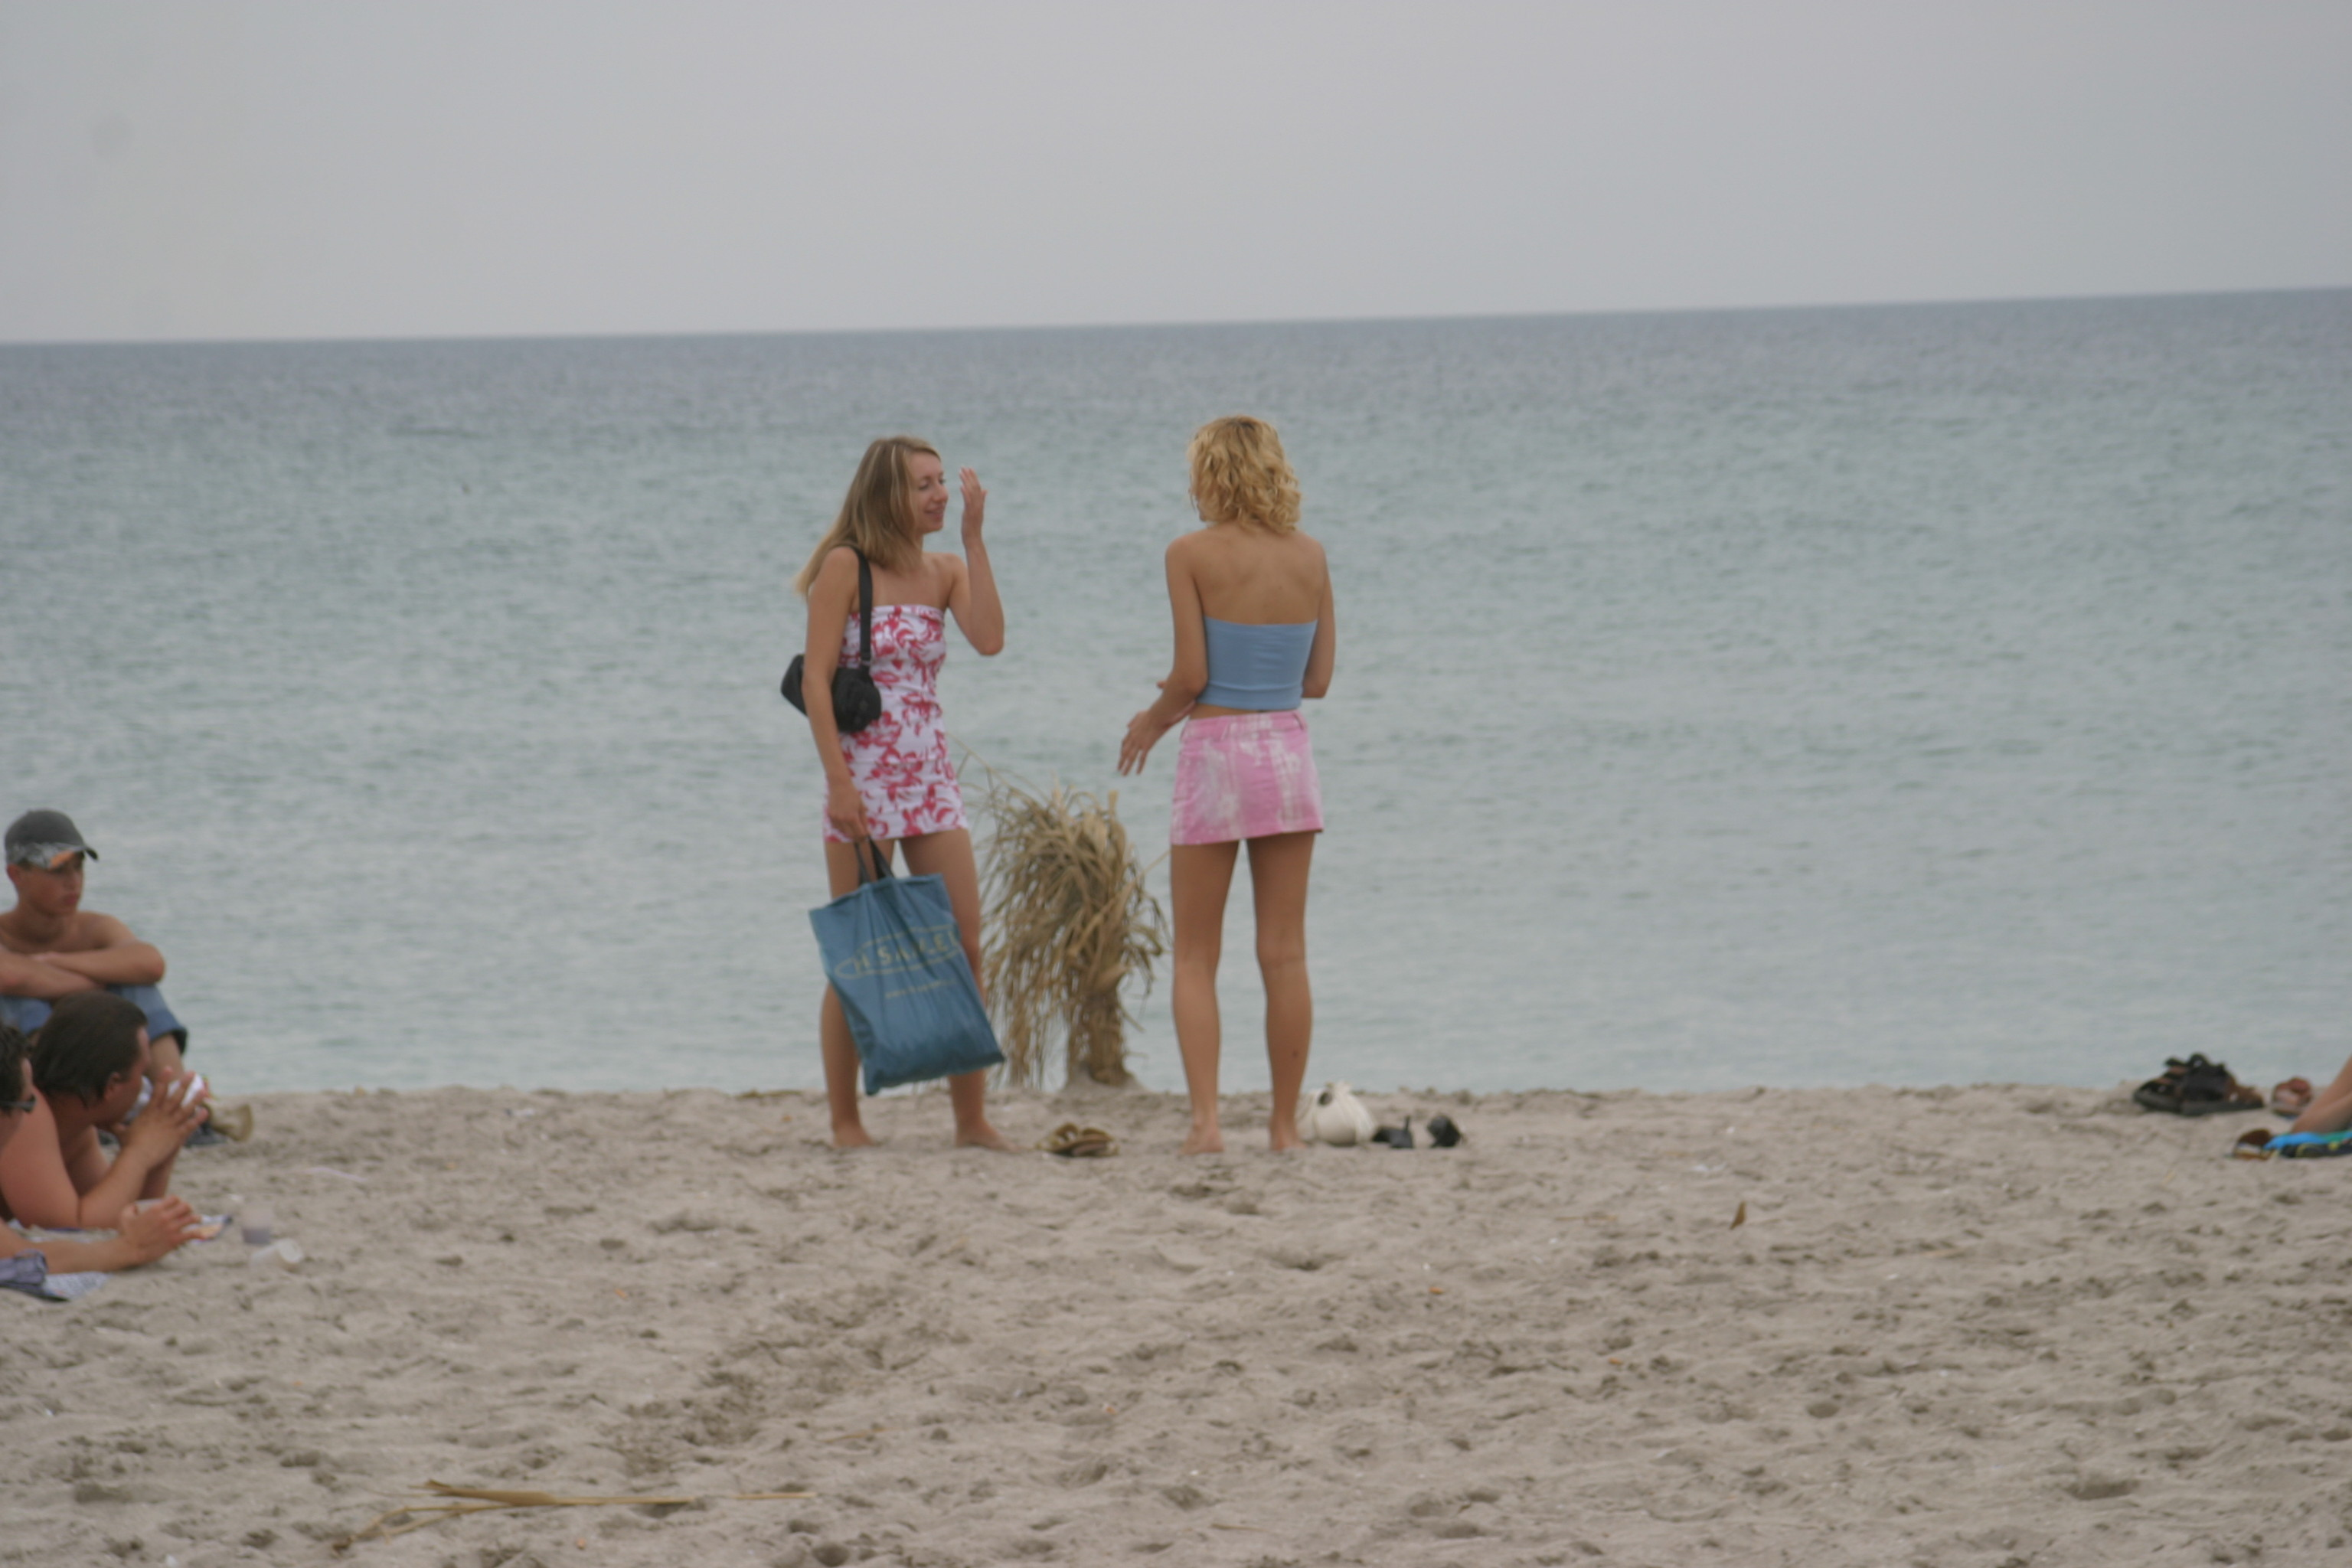 vika-y-lena-l-beach-nude-in-public-metart-01